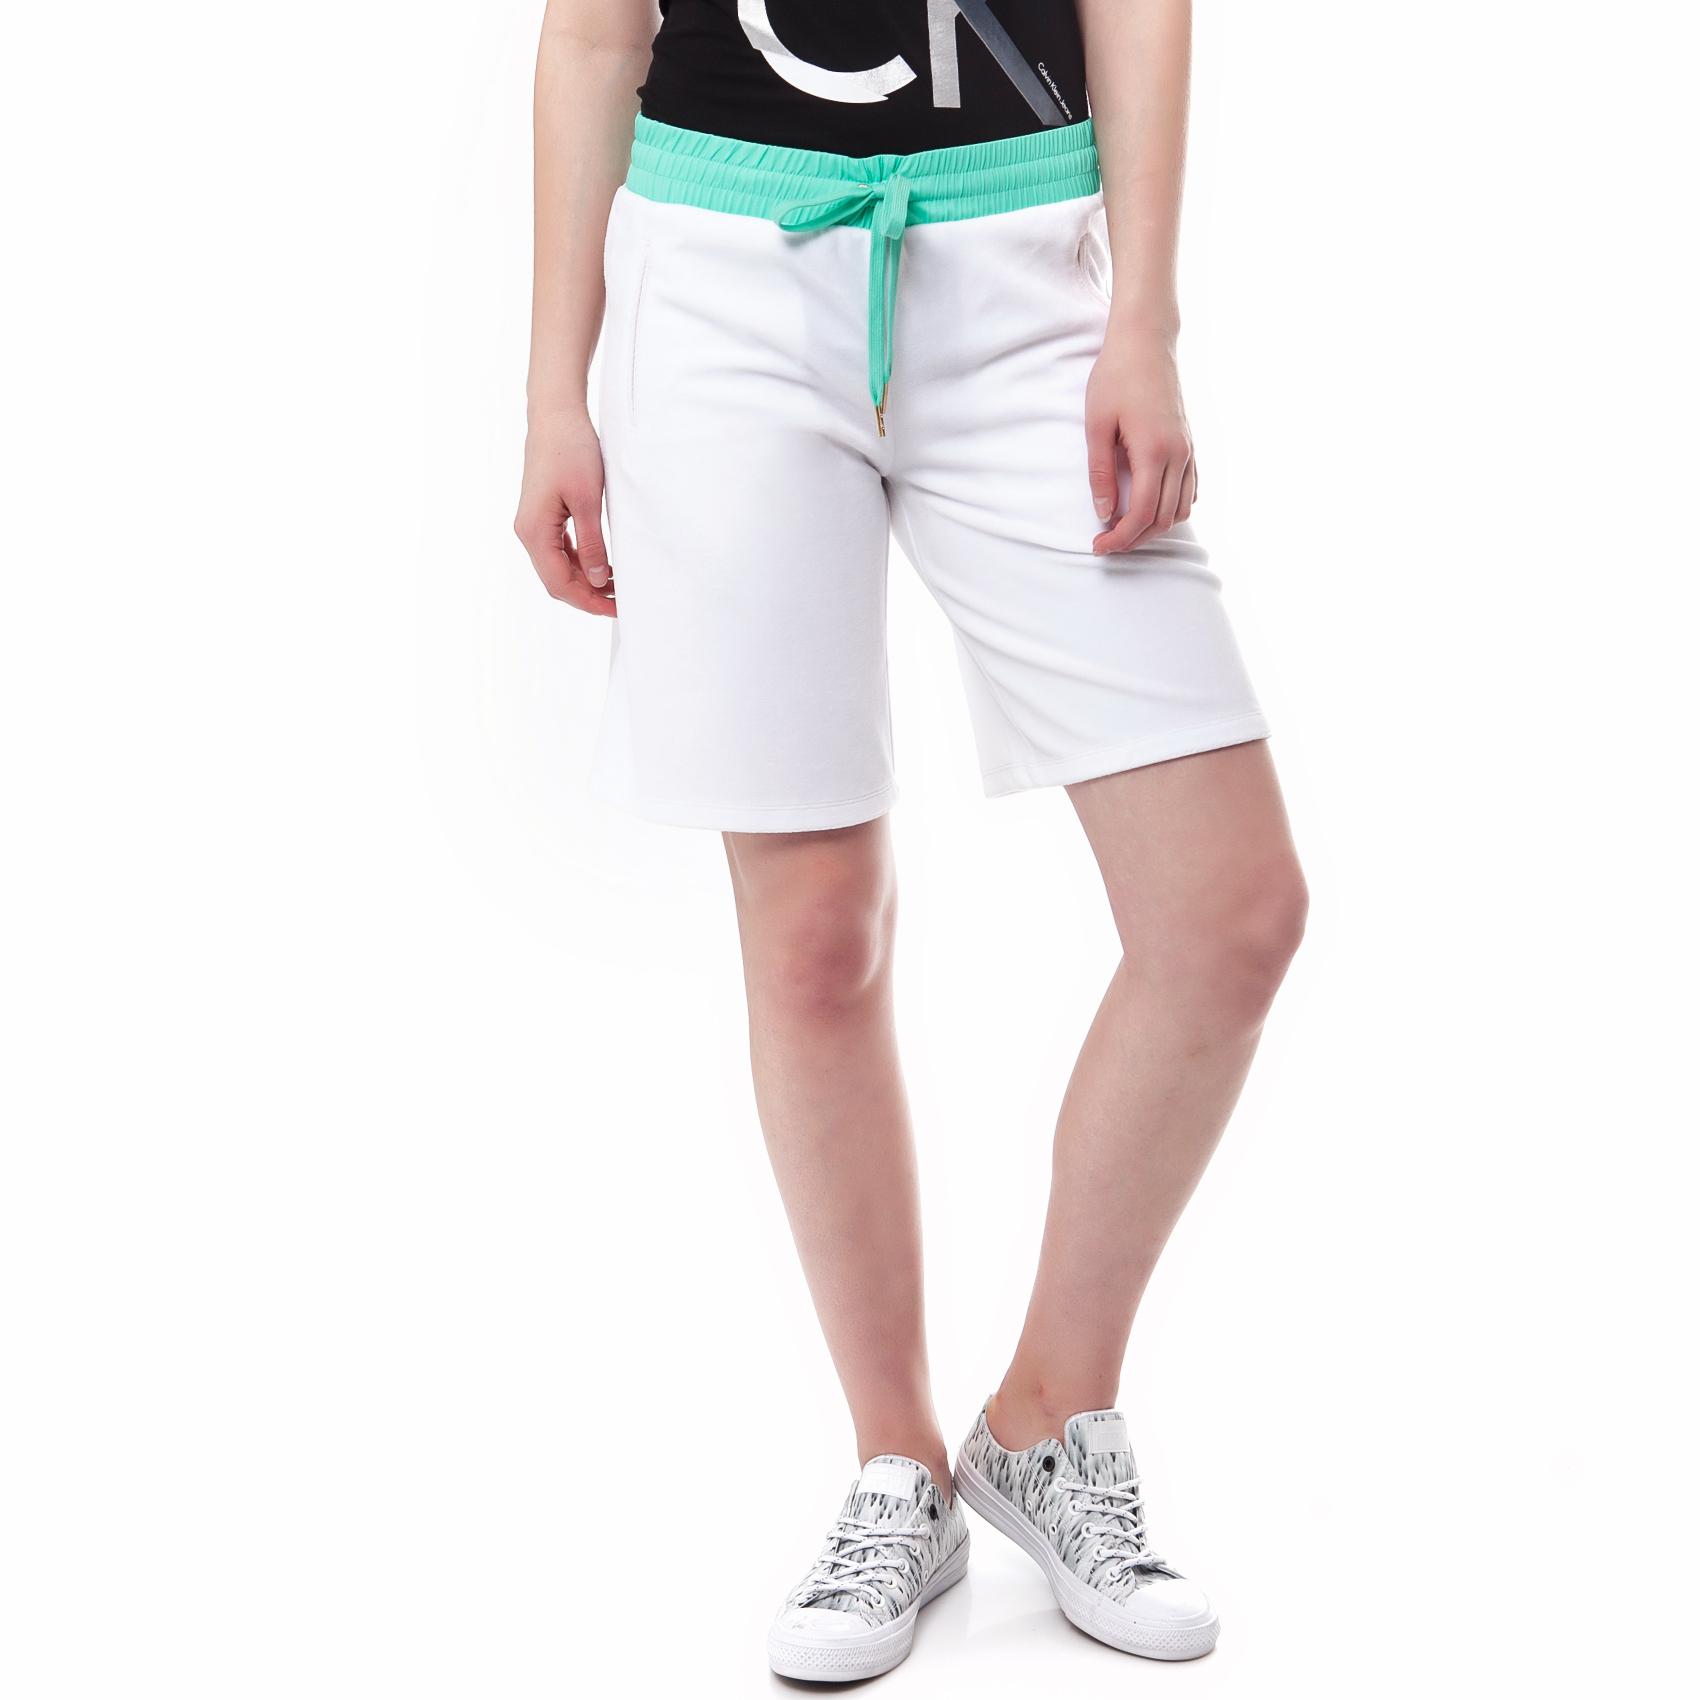 JUICY COUTURE - Γυναικεία βερμούδα Juicy Couture λευκή